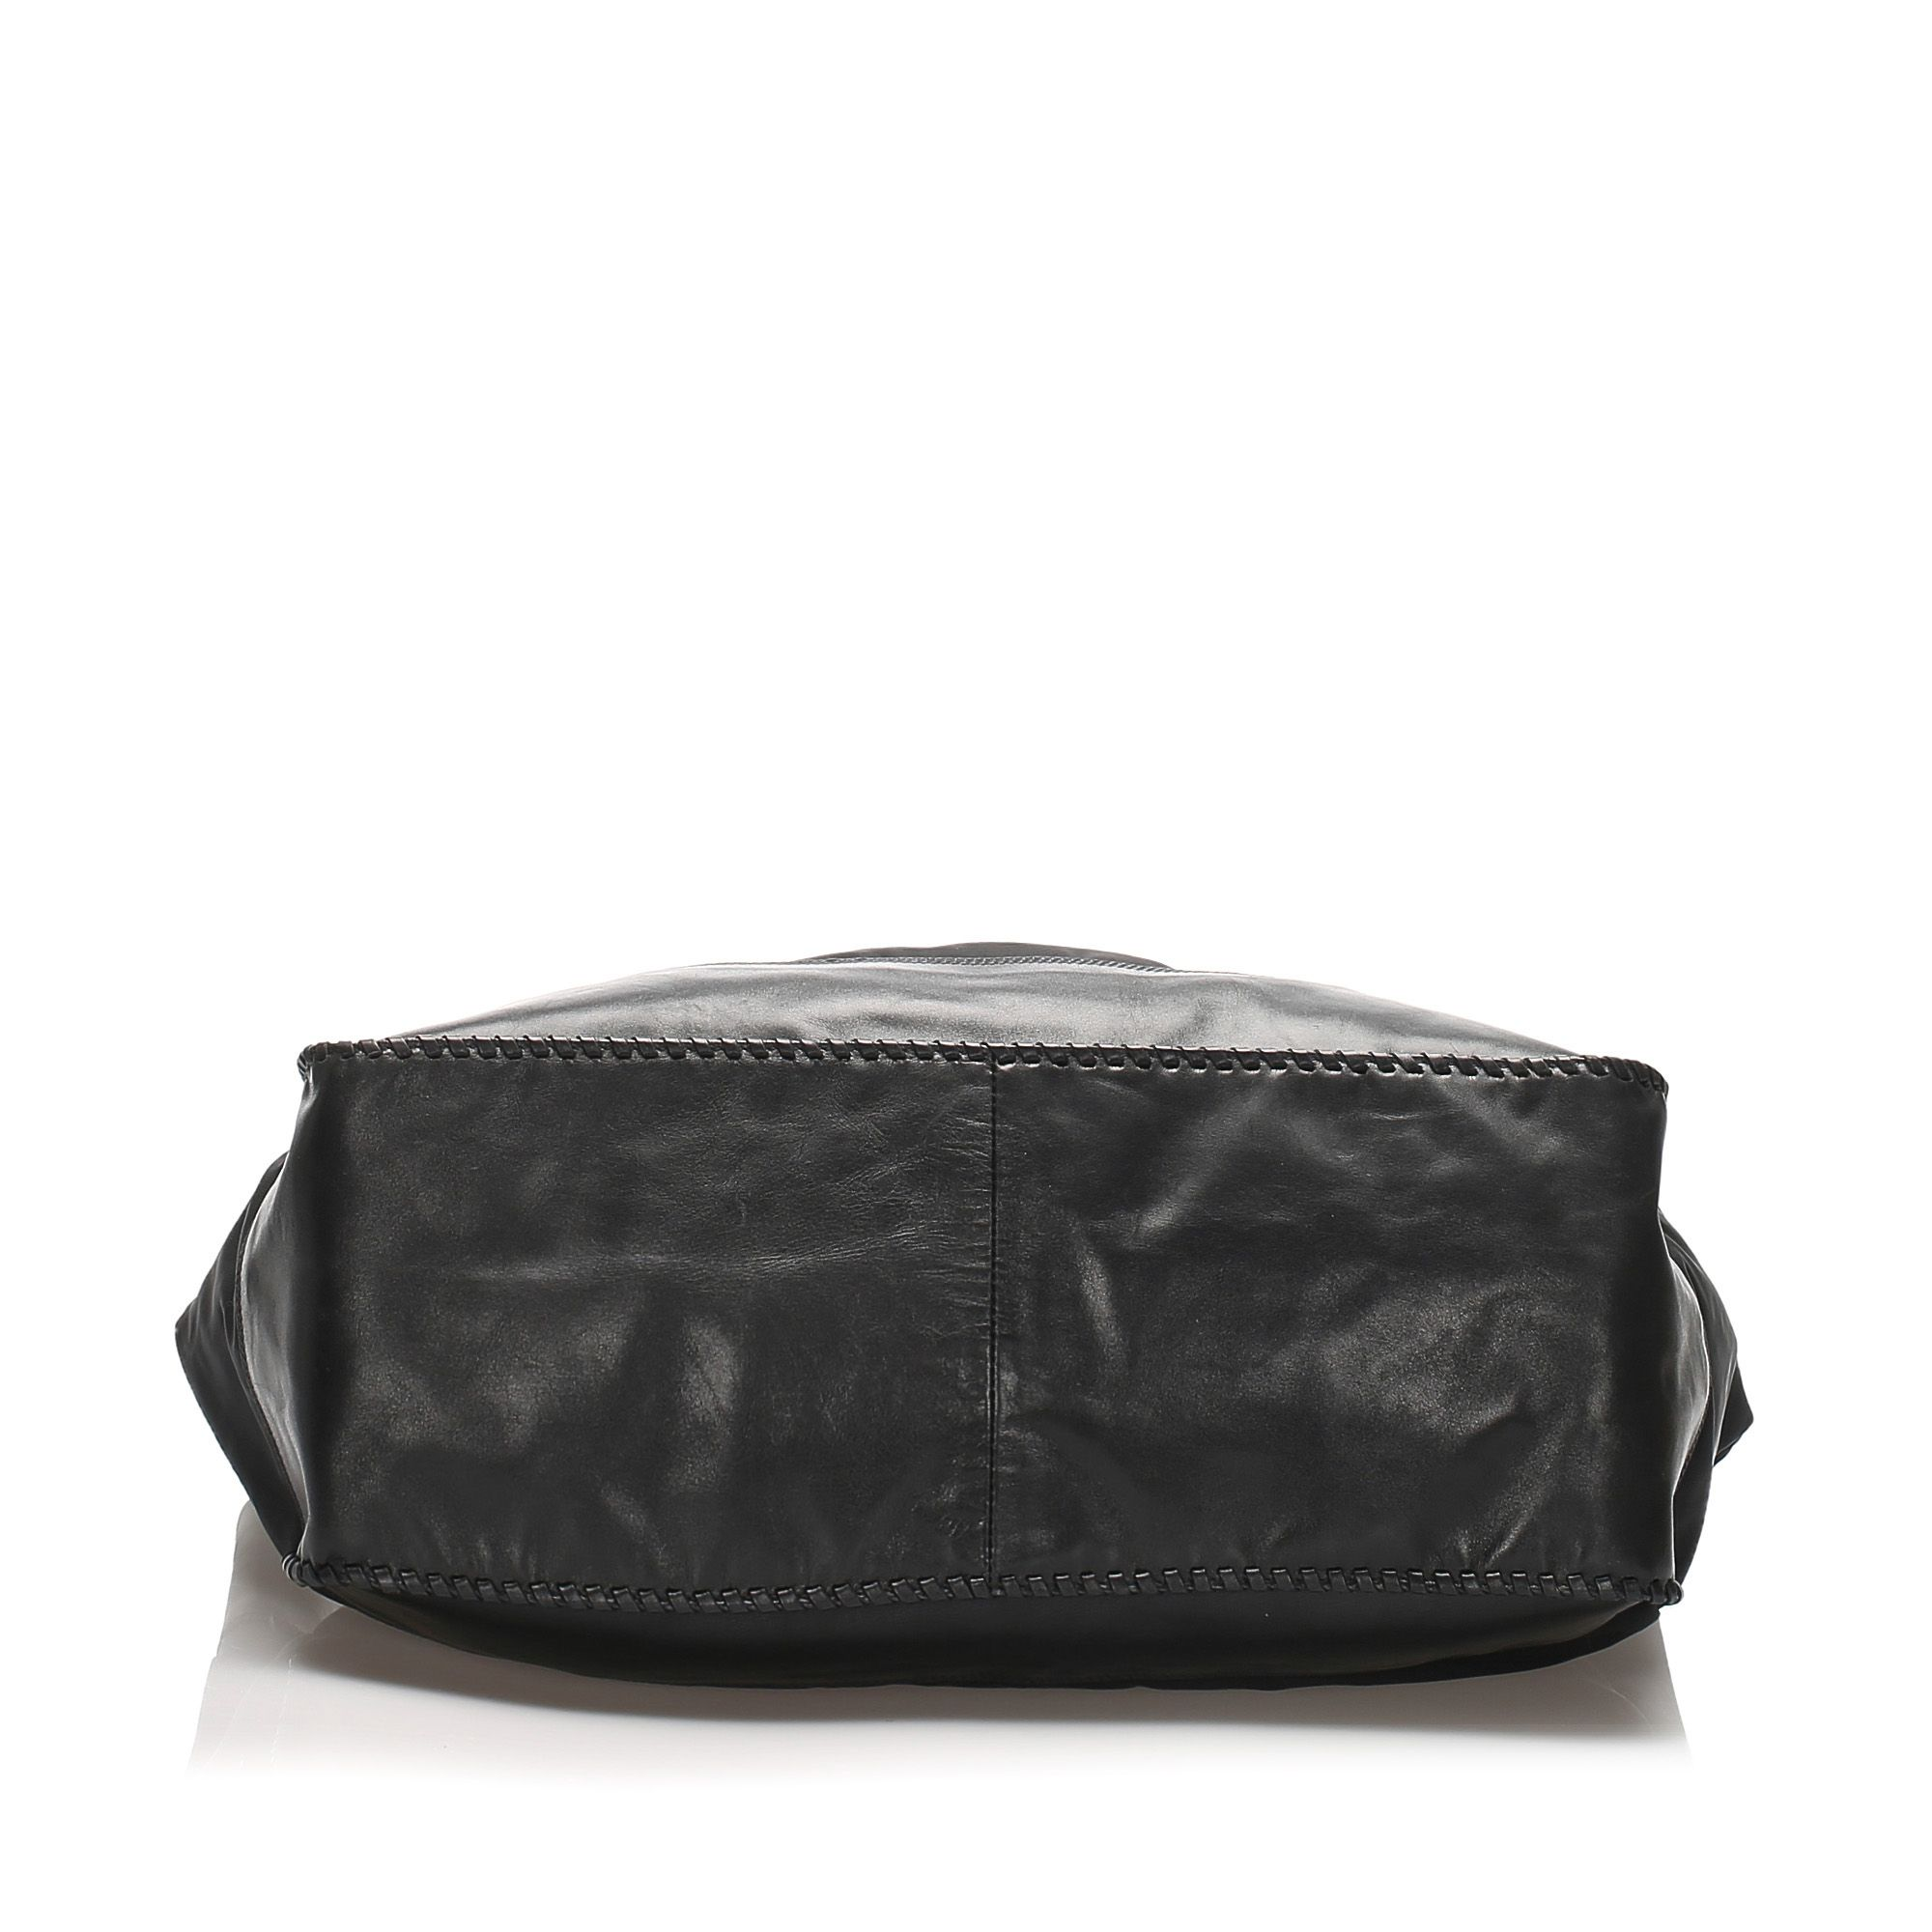 Vintage Prada Tessuto Drawstring Shoulder Bag Black